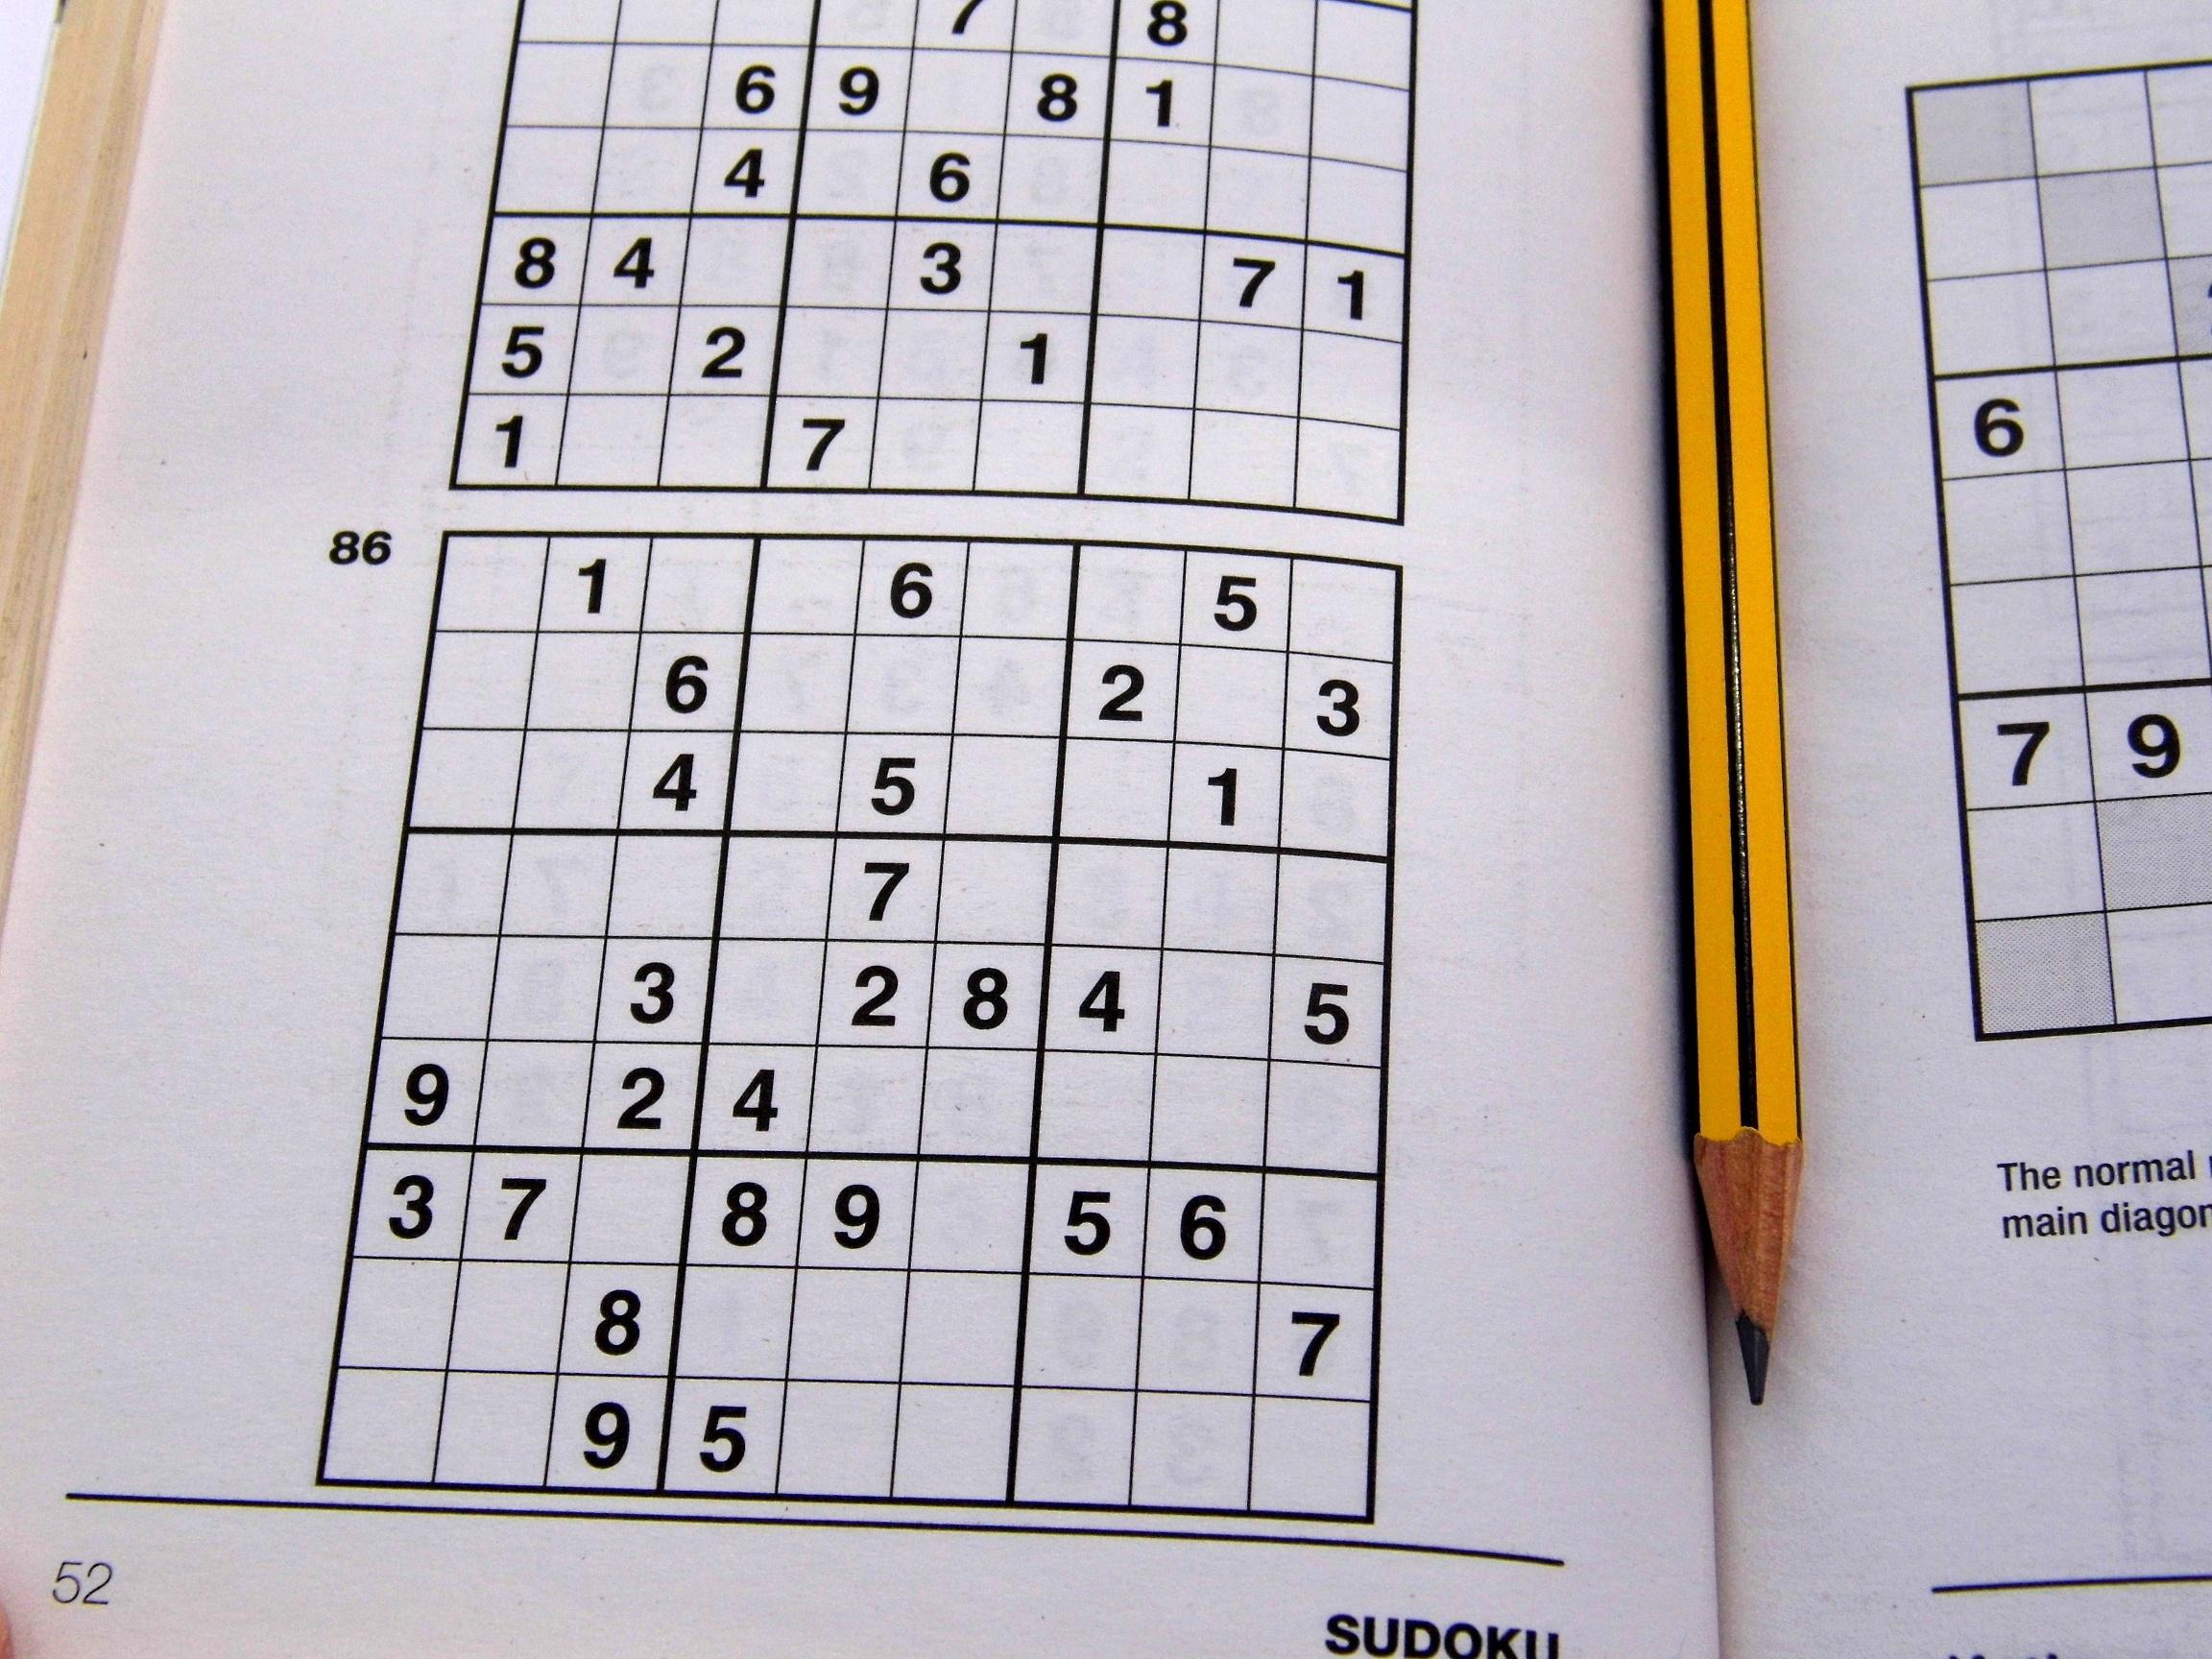 Medium Printable Sudoku Puzzles 6 Per Page – Book 1 – Free Sudoku - Free Printable Sudoku 6 Per Page